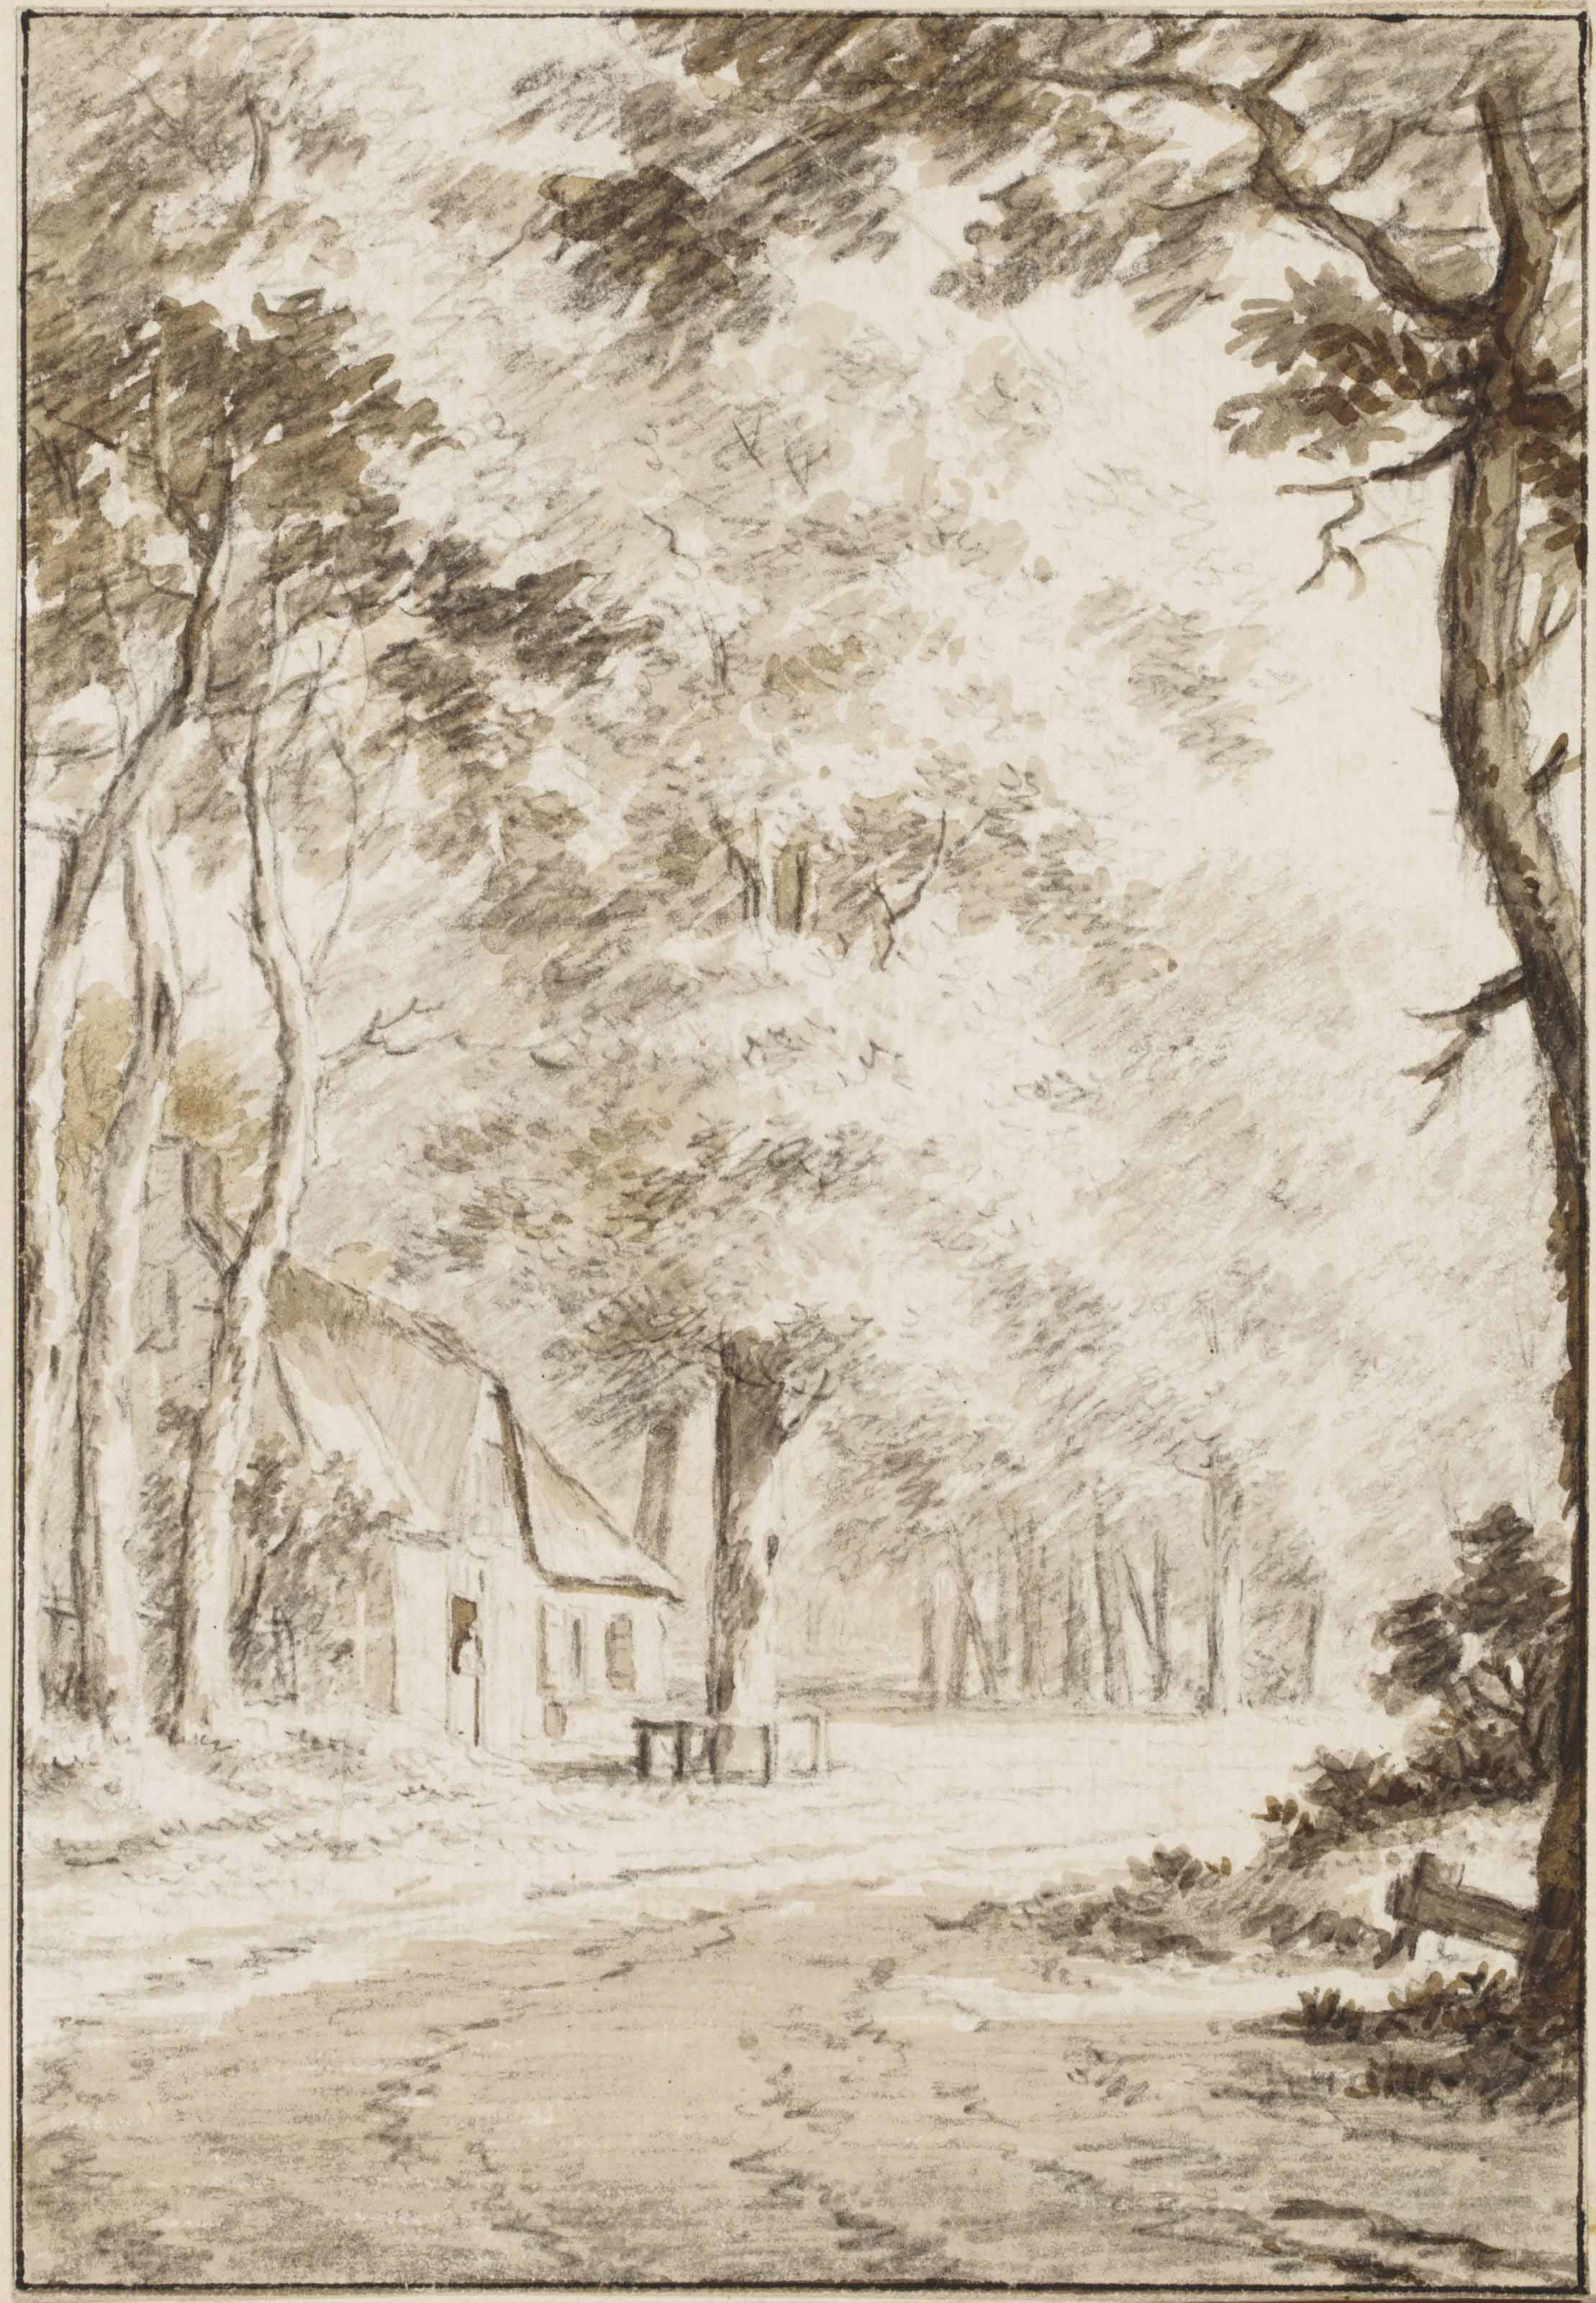 Jacob Cats (Altenau 1741-1799 Amsterdam)